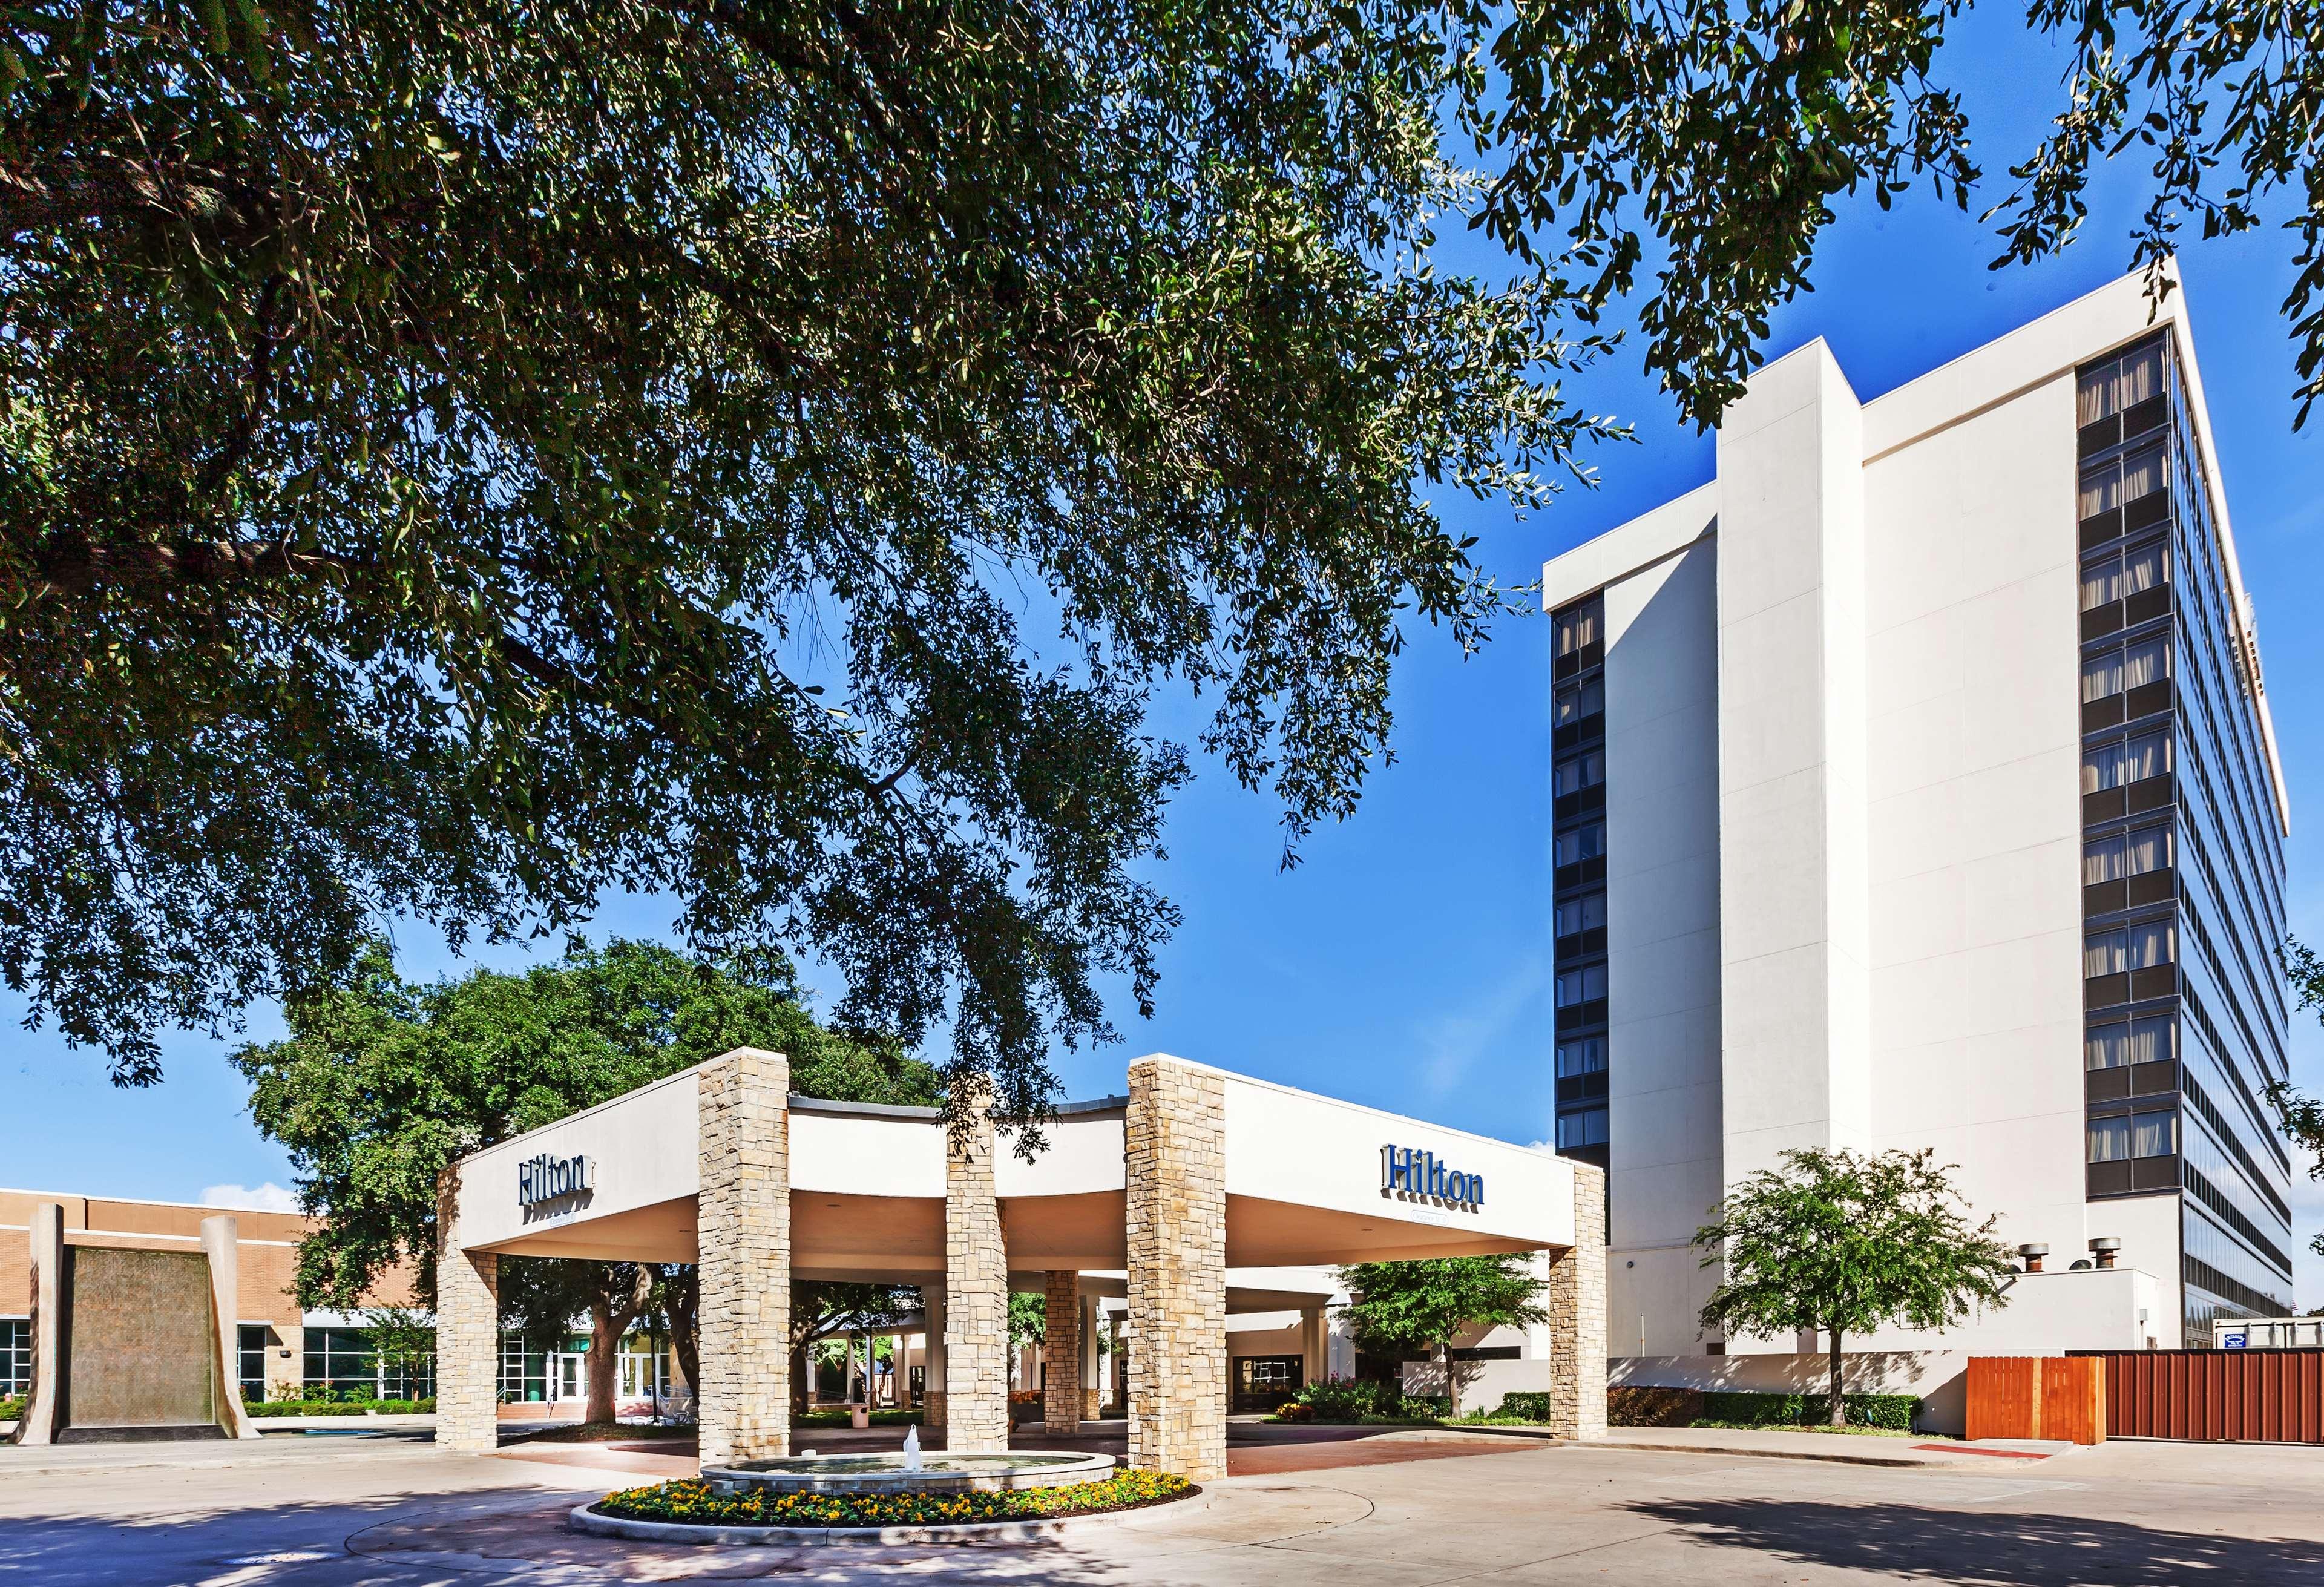 Hilton Waco image 8